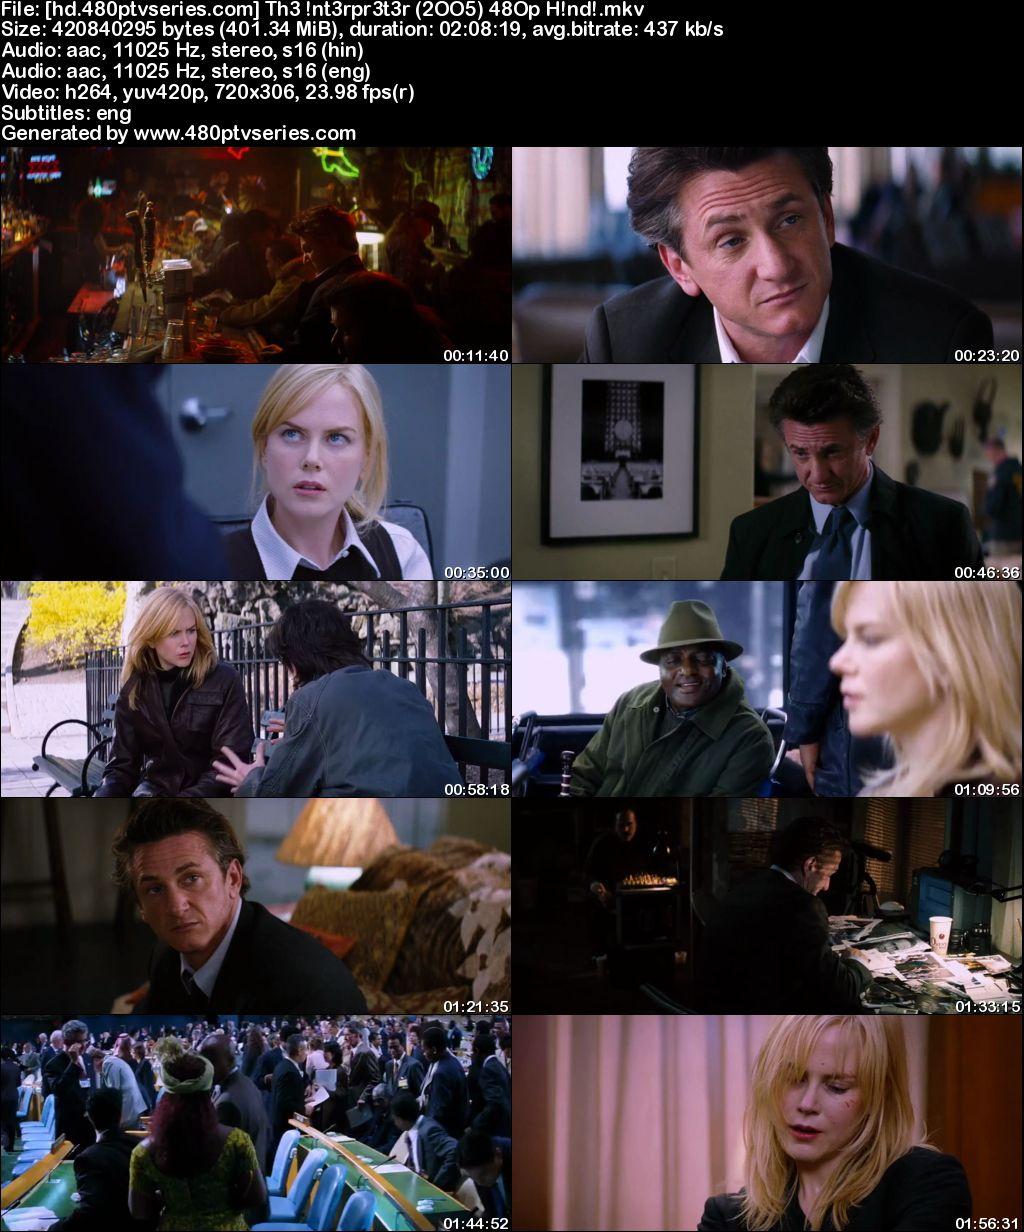 The Interpreter (2005) 400MB Full Hindi Dual Audio Movie Download 480p Bluray Free Watch Online Full Movie Download Worldfree4u 9xmovies